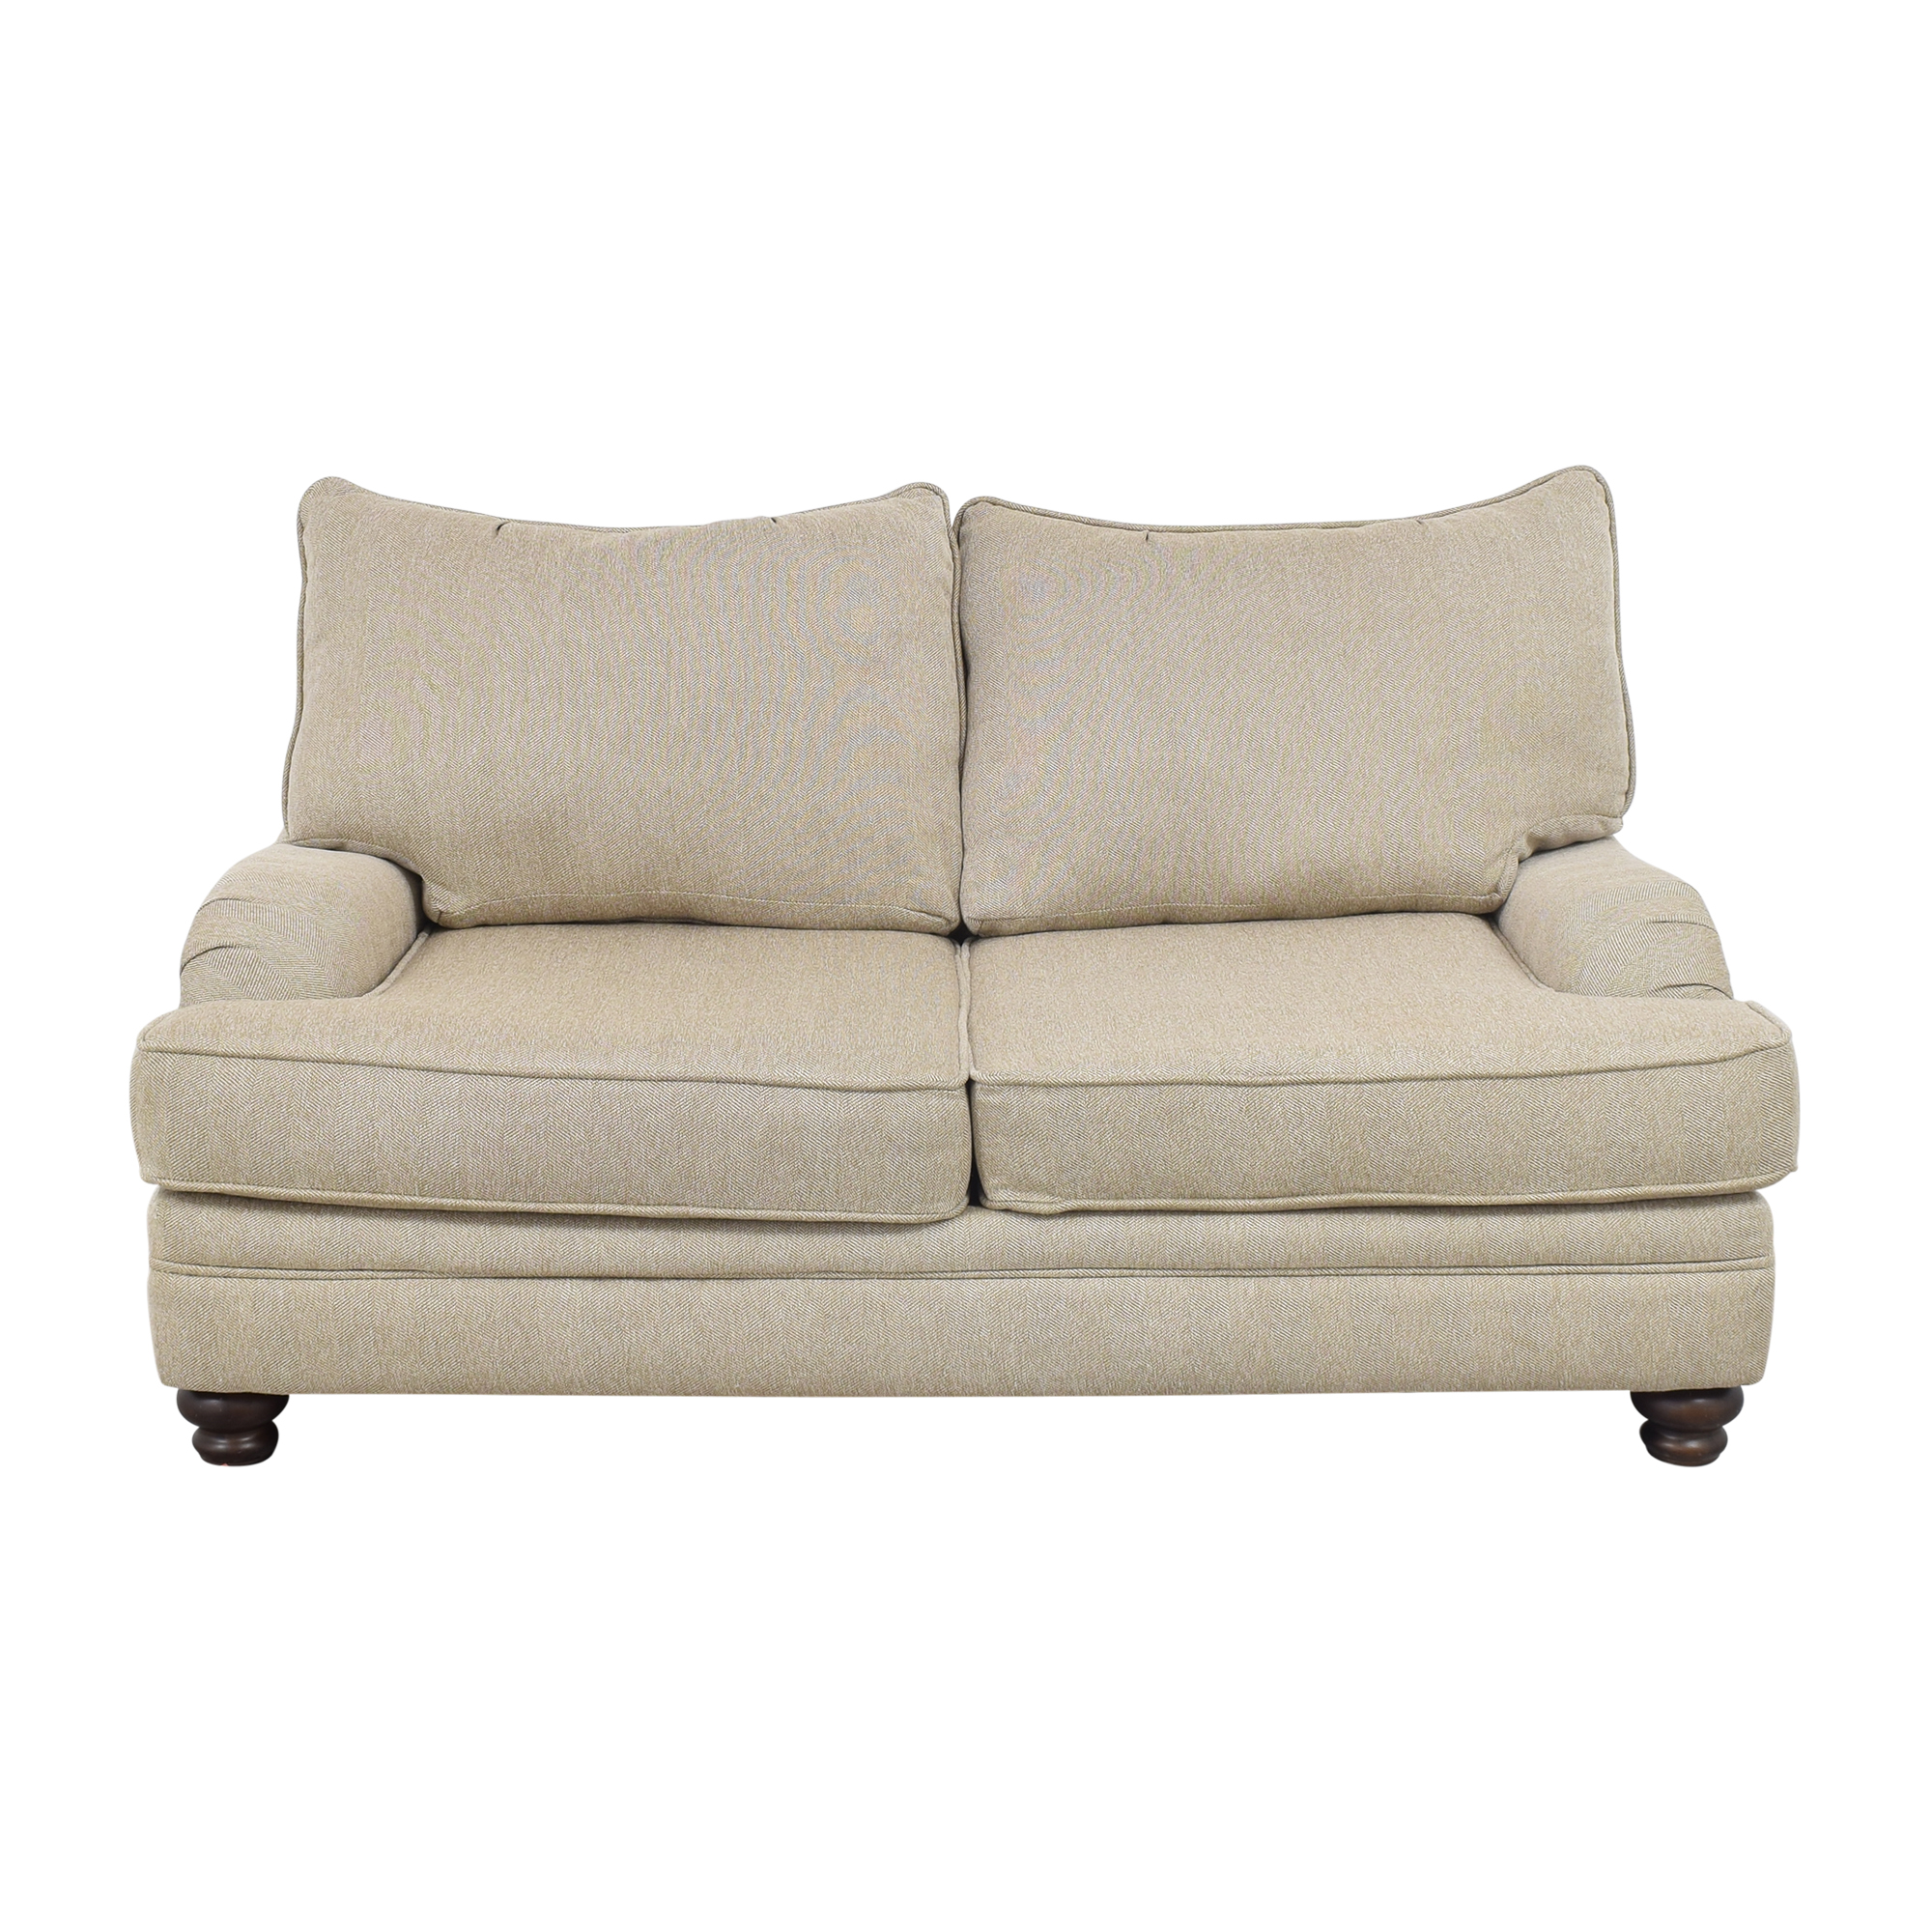 Corinthian Corinthian English Roll Arm Sofa used